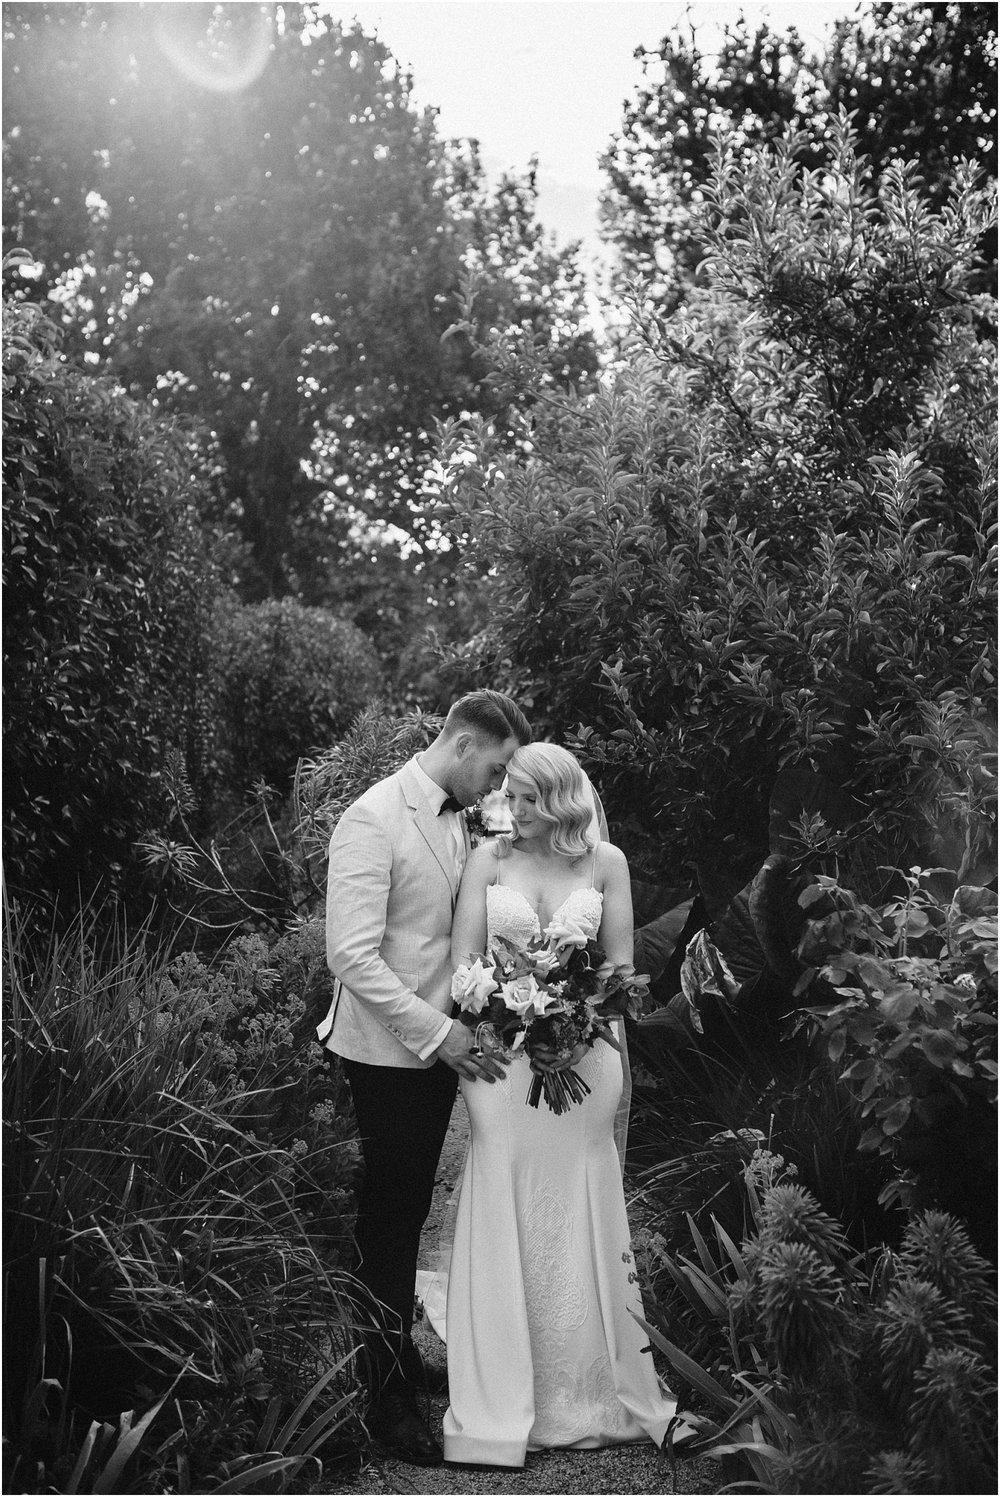 Katherine and Sam's stylish elopment at the Euroa Butter Factory._0063.jpg